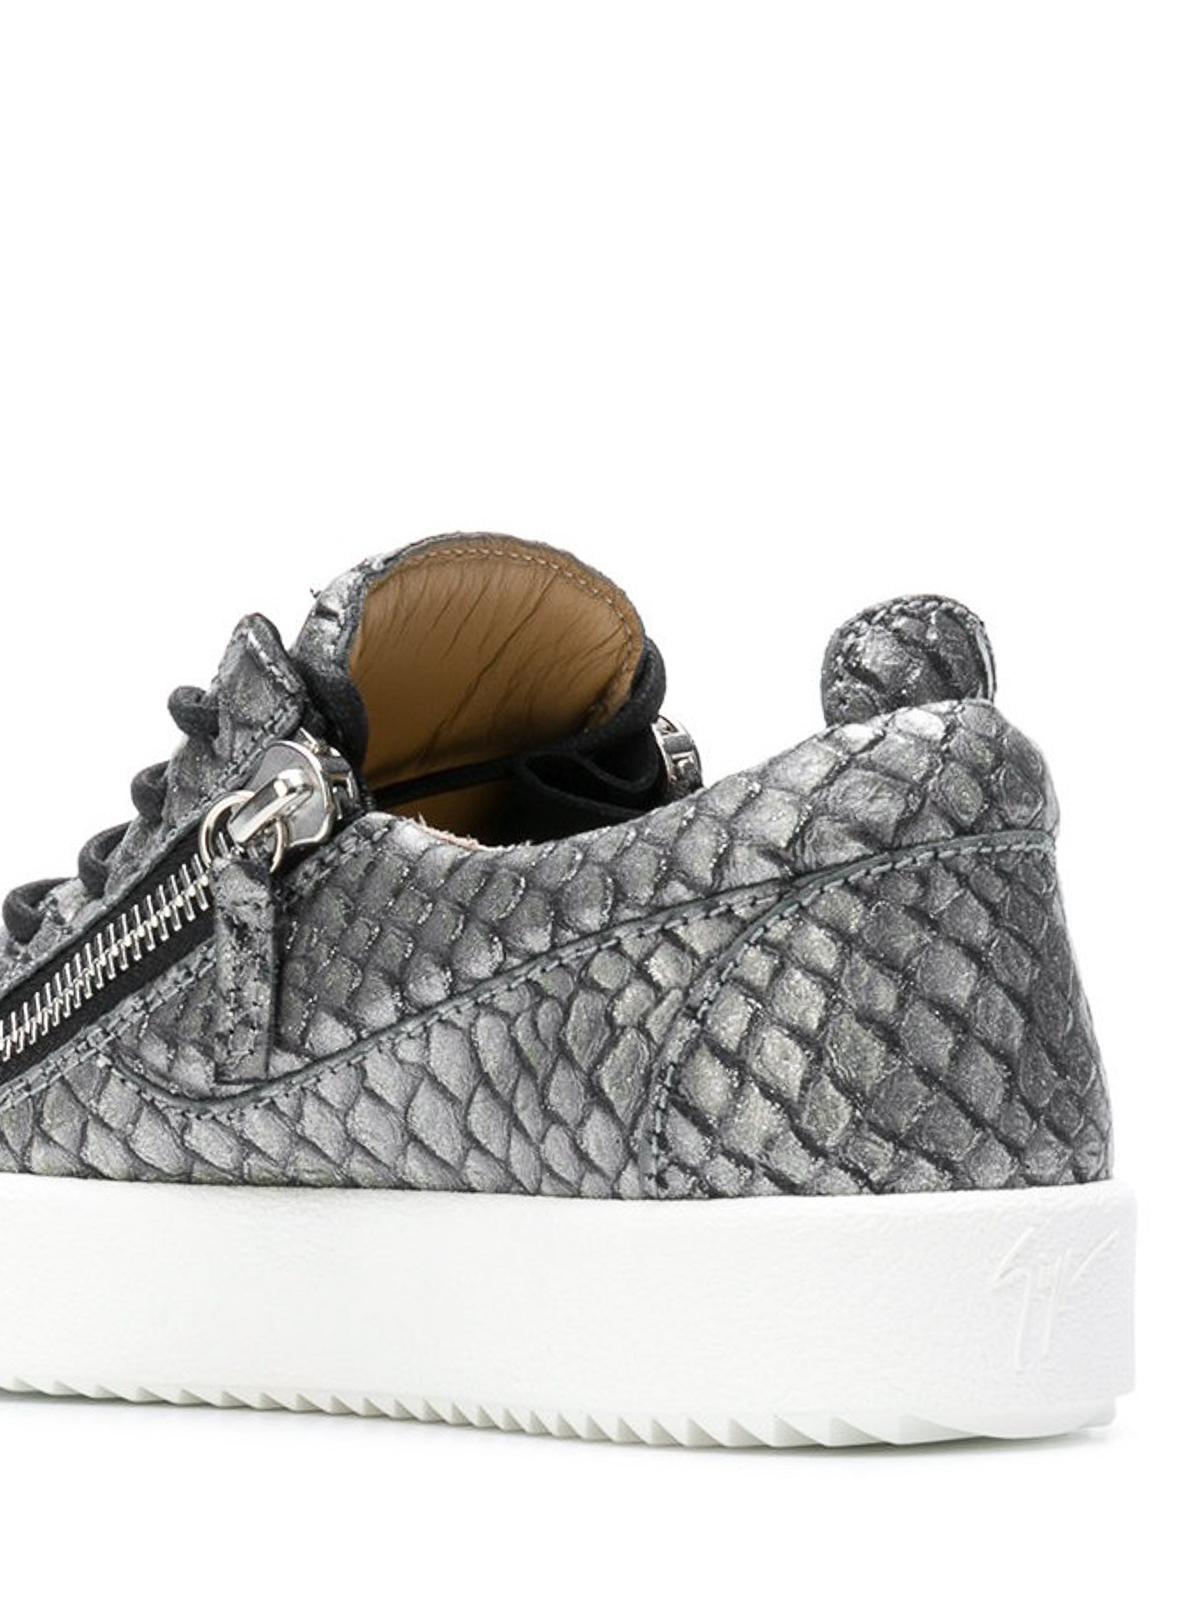 16118e1136bcc Giuseppe Zanotti - May London grey reptile print sneakers - trainers ...